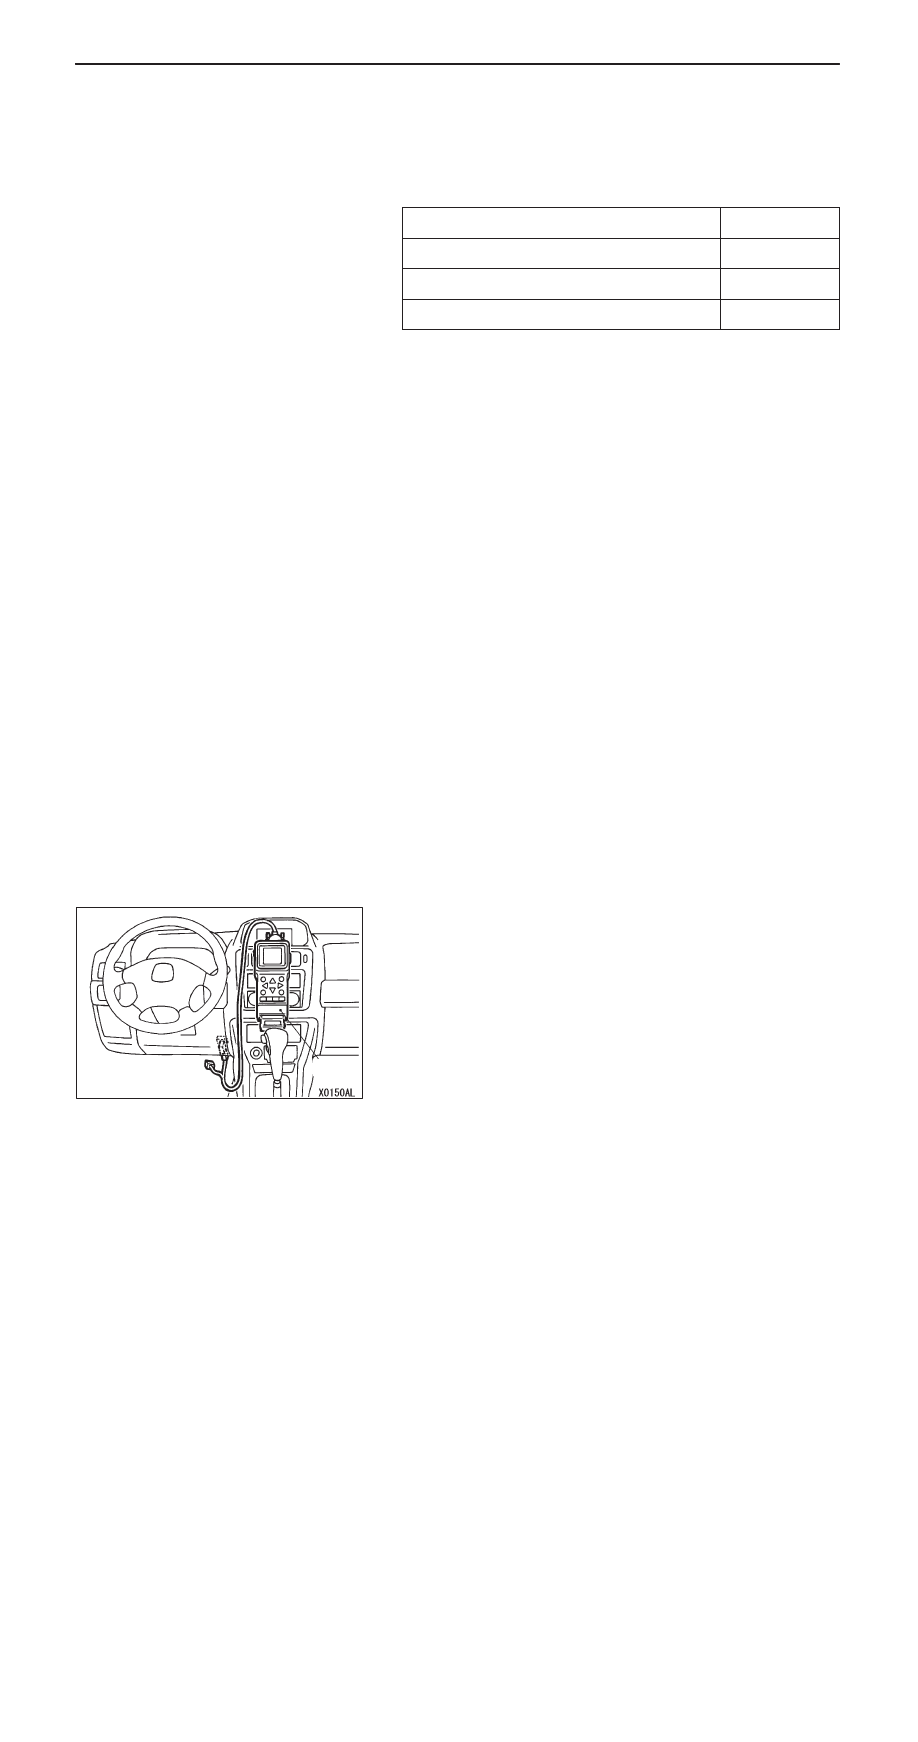 Mitsubishi Pajero Pinin  Manual - part 324